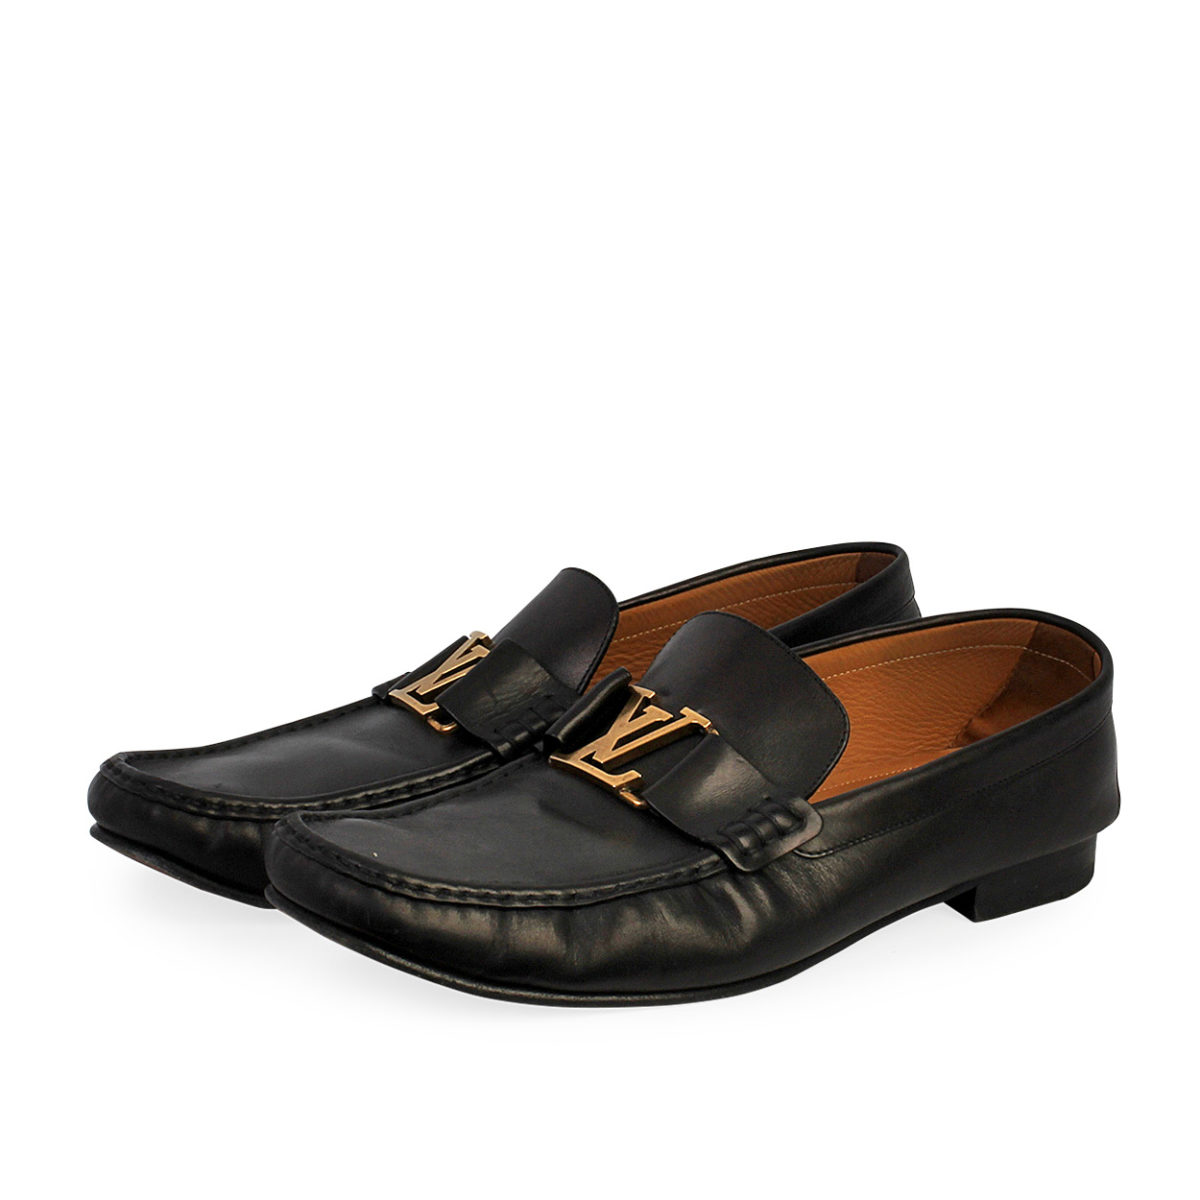 LOUIS VUITTON Leather Monte Carlo Moccasins Black - S: 46 (11)